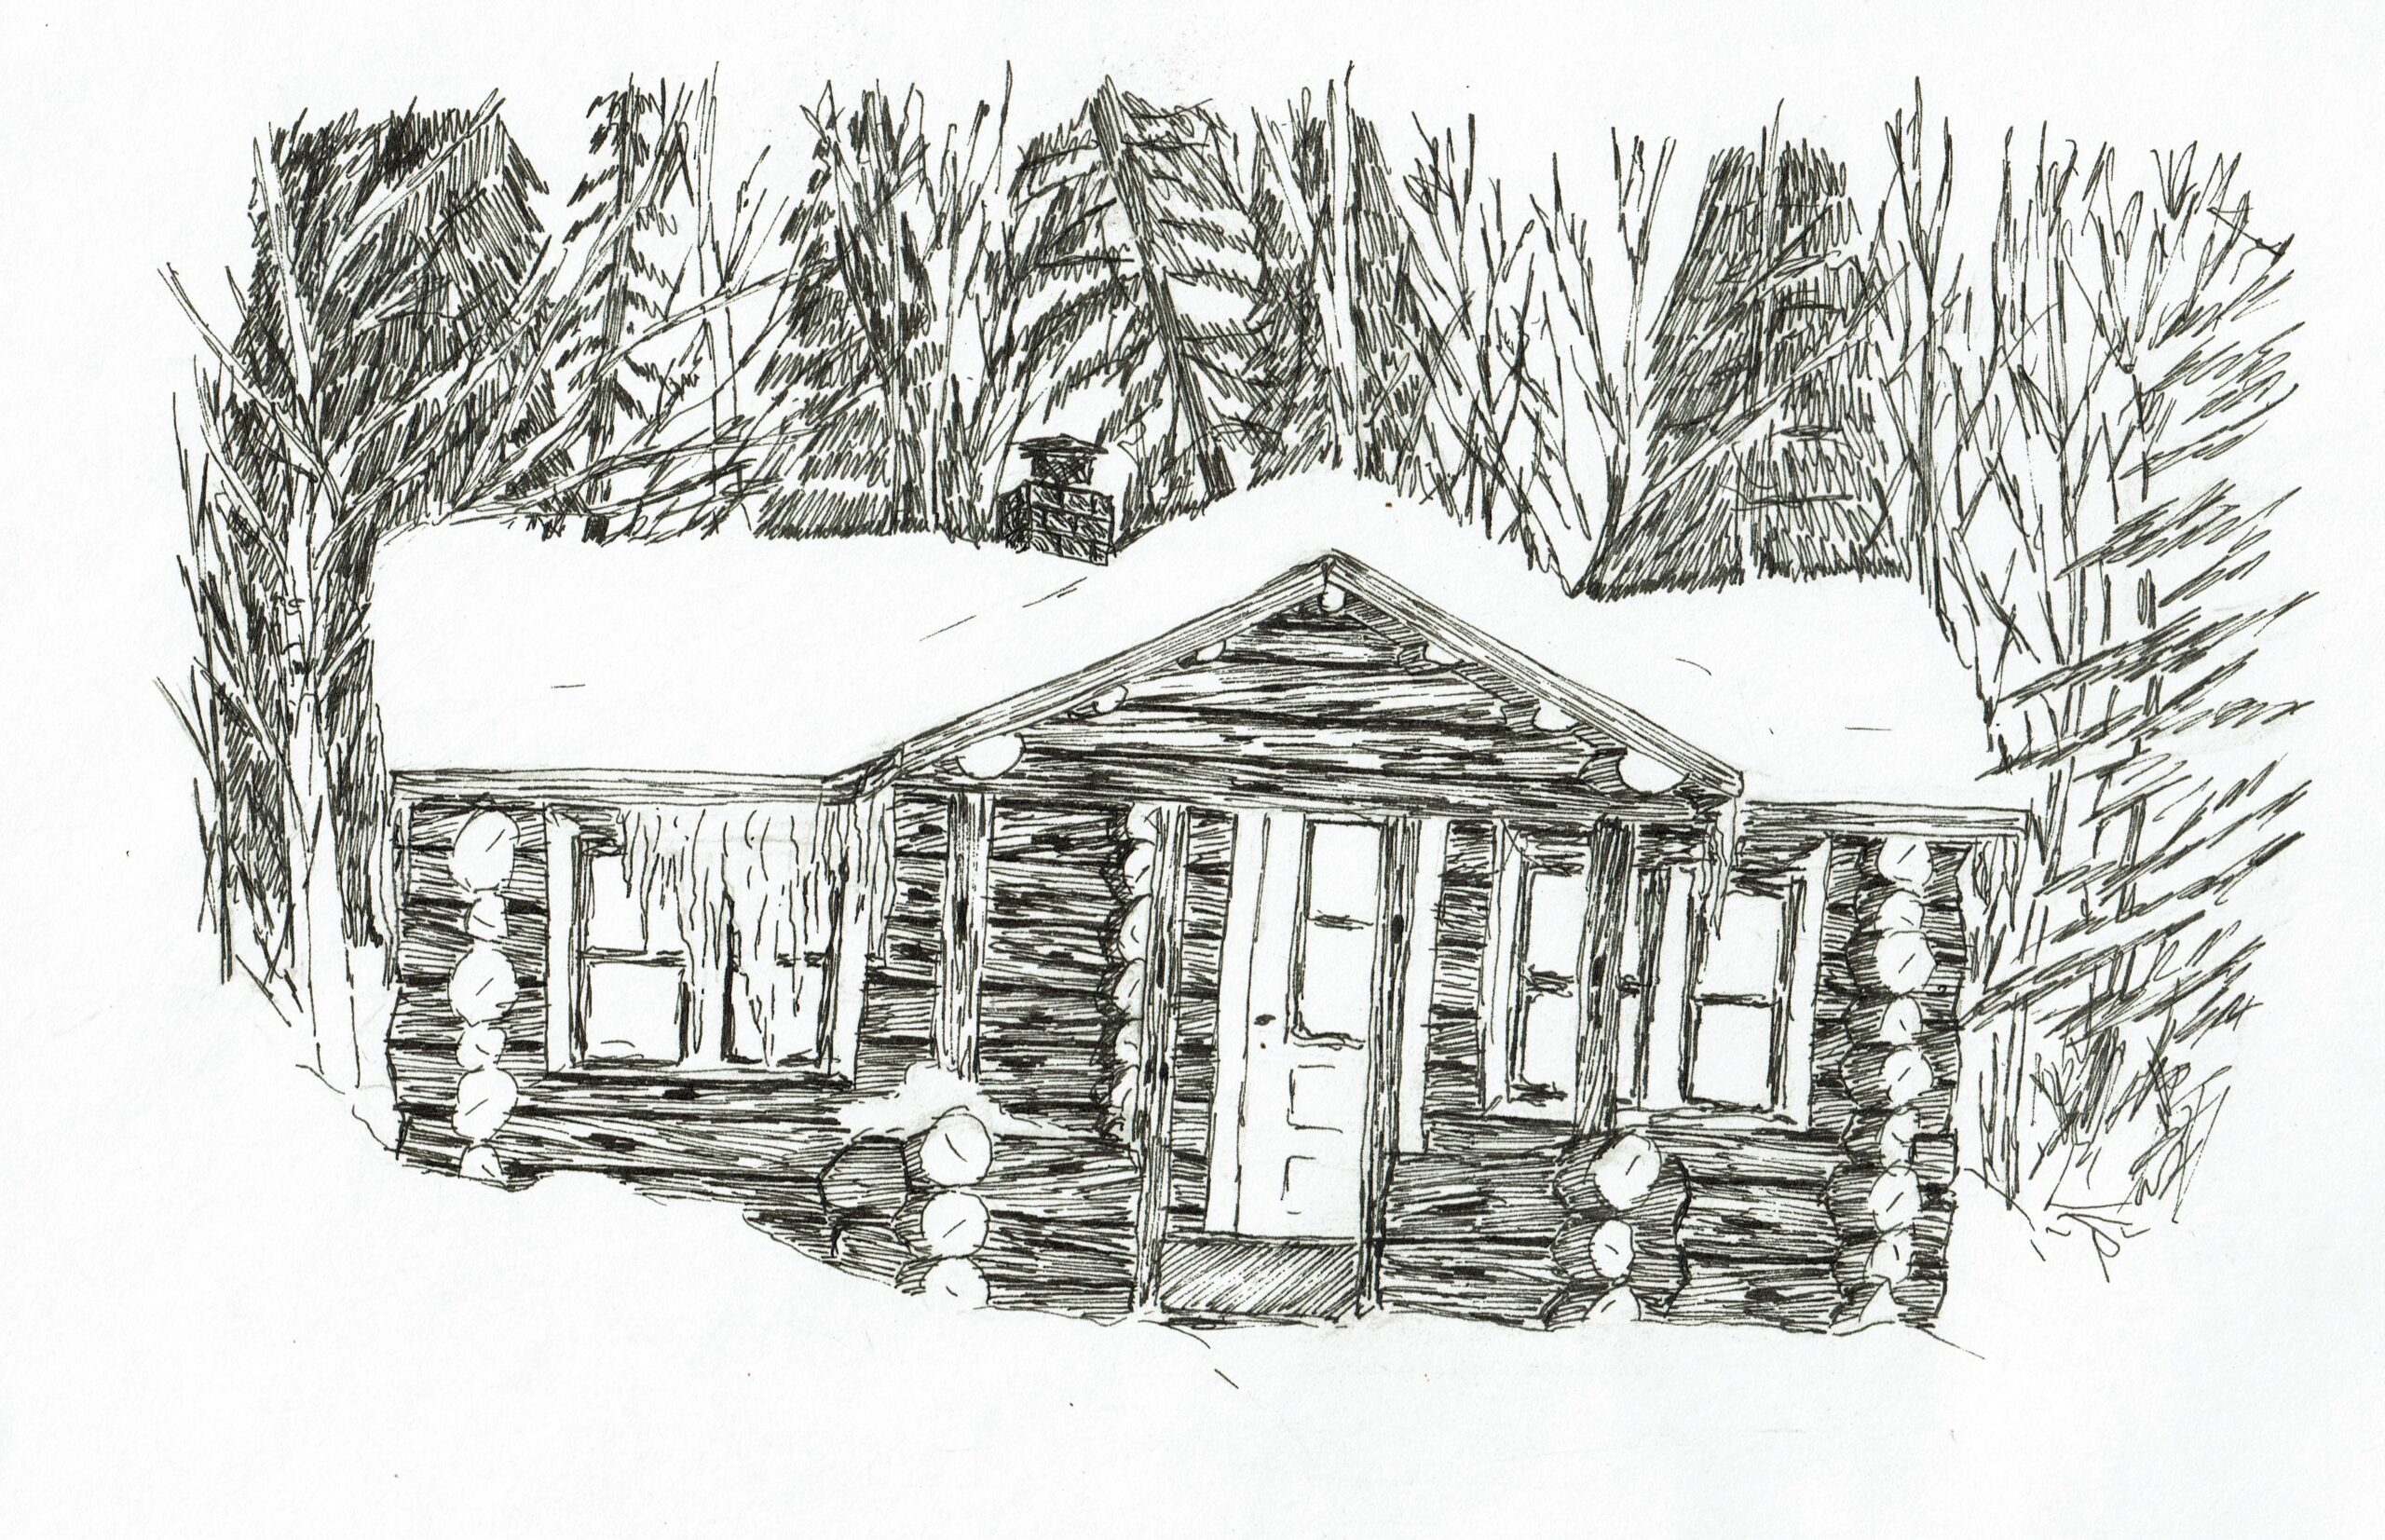 Buyck log cabin, ink drawing